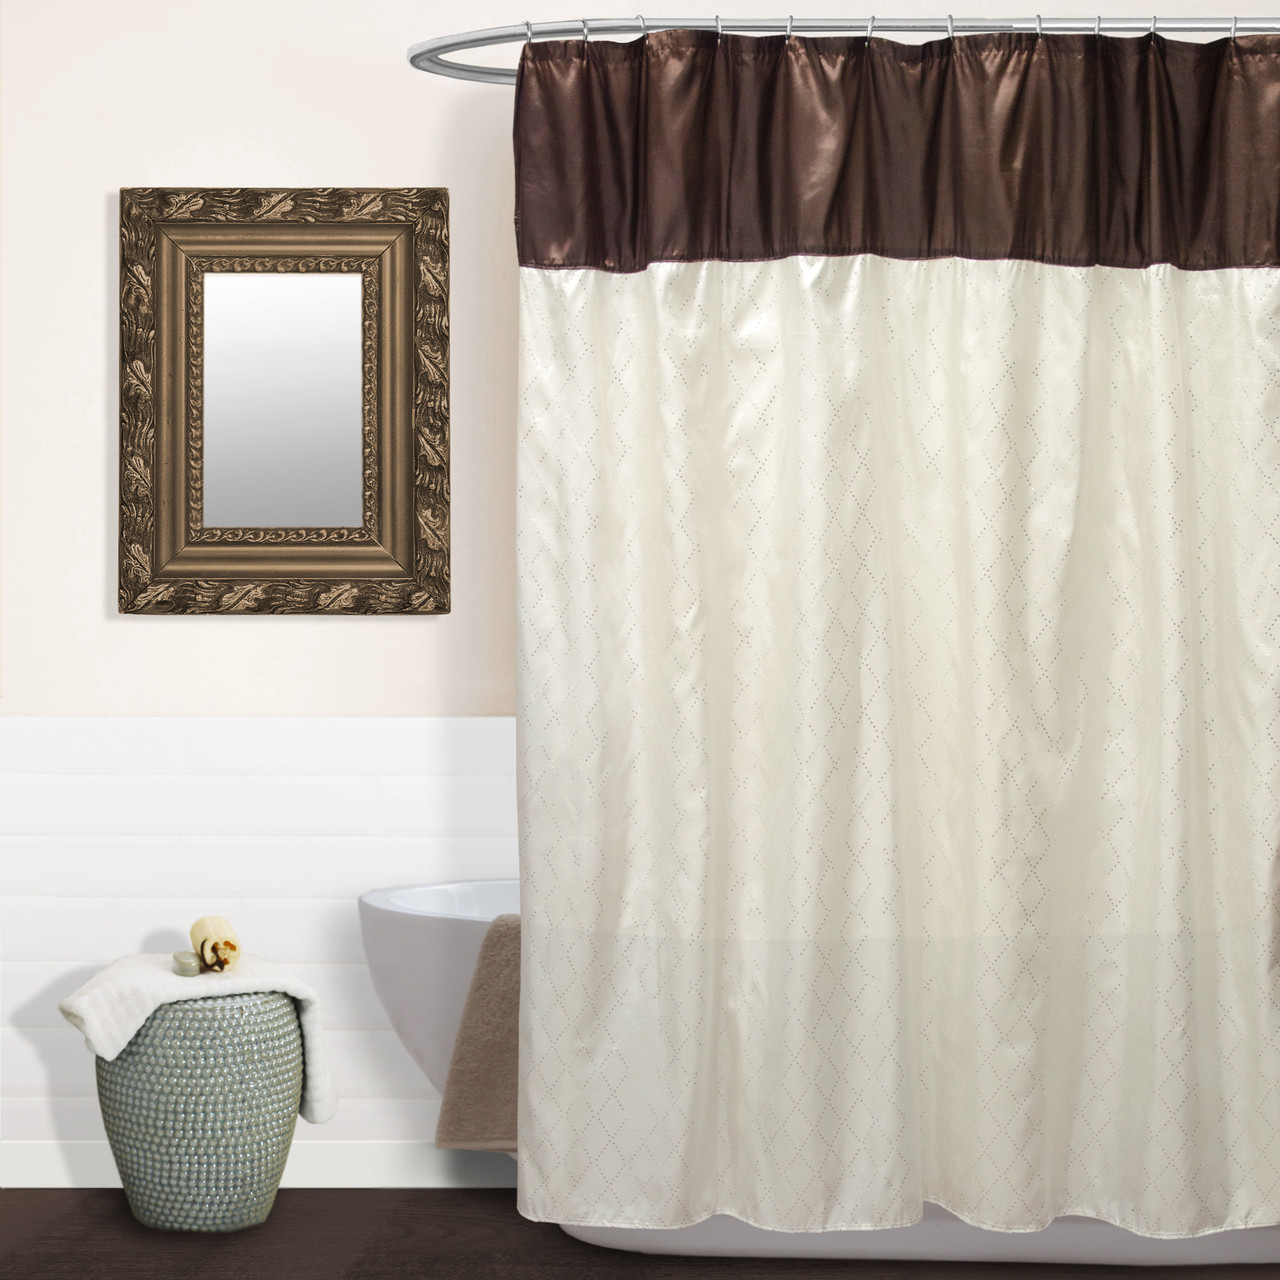 Sequin Taffeta Fabric Shower Curtain 70x72 Monaco